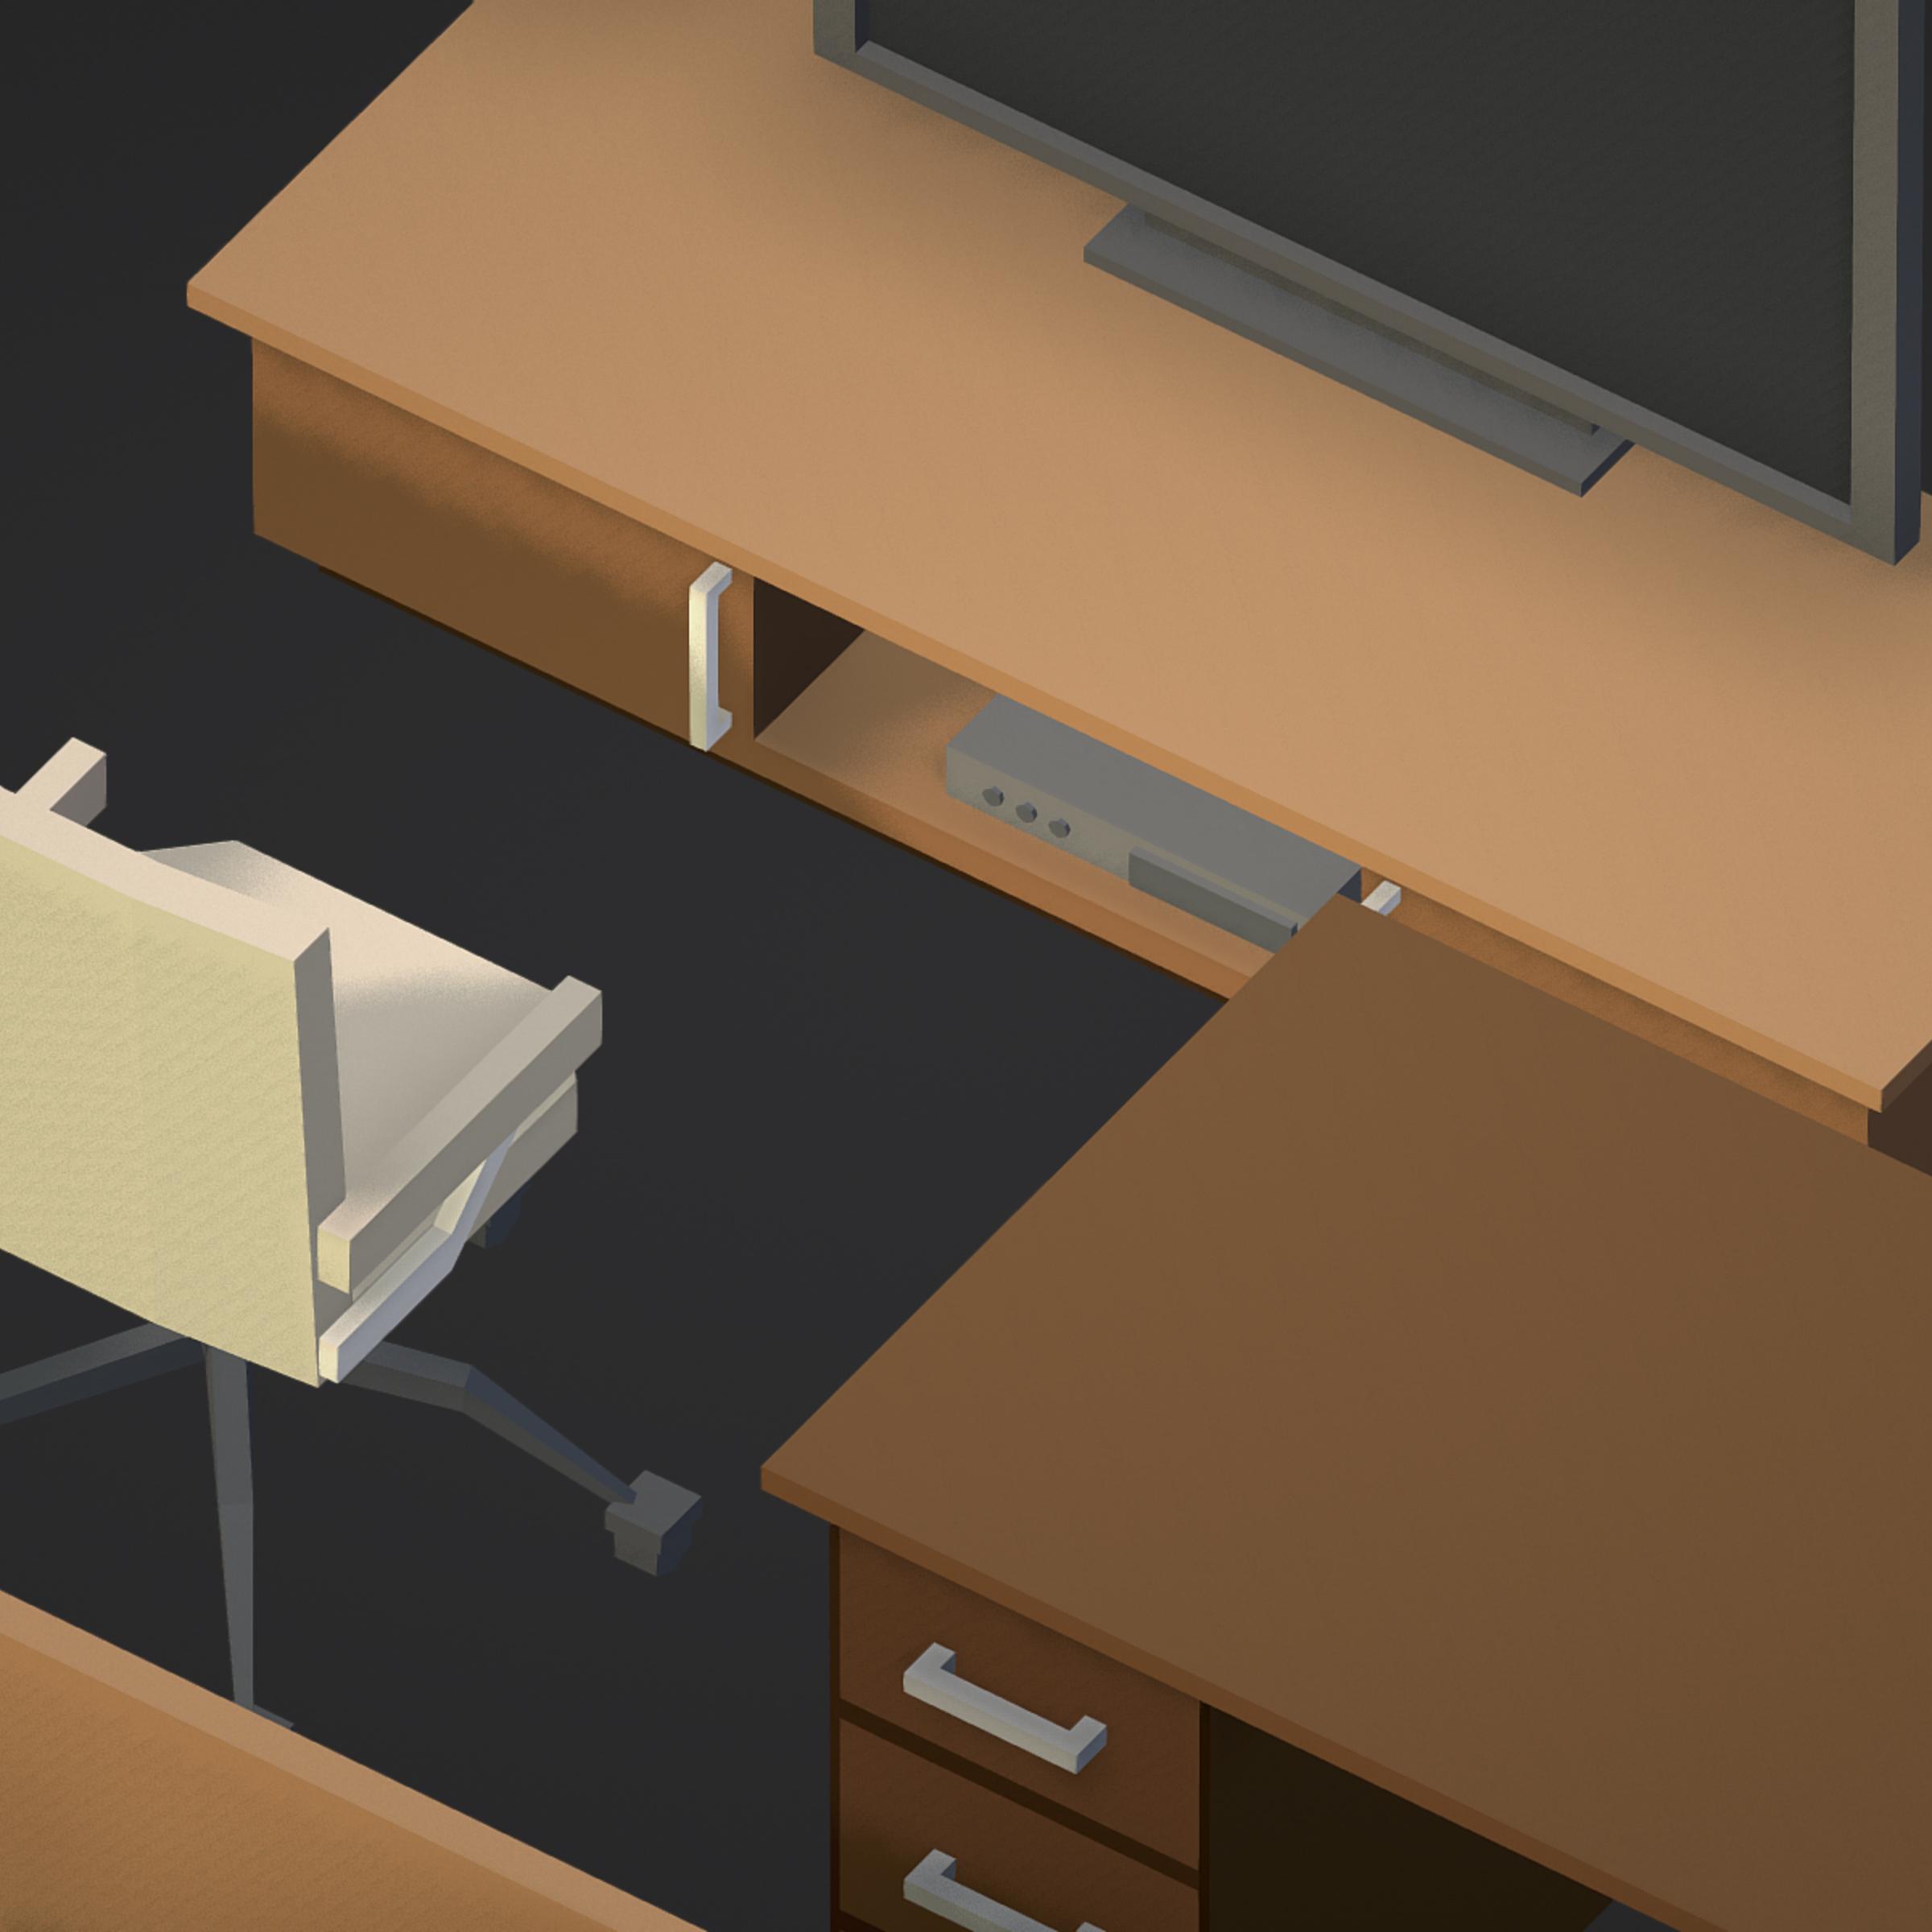 100 object Isometric Home Office Furniture Fitness 3d model max 3ds max plugin fbx ma mb png obj 271915